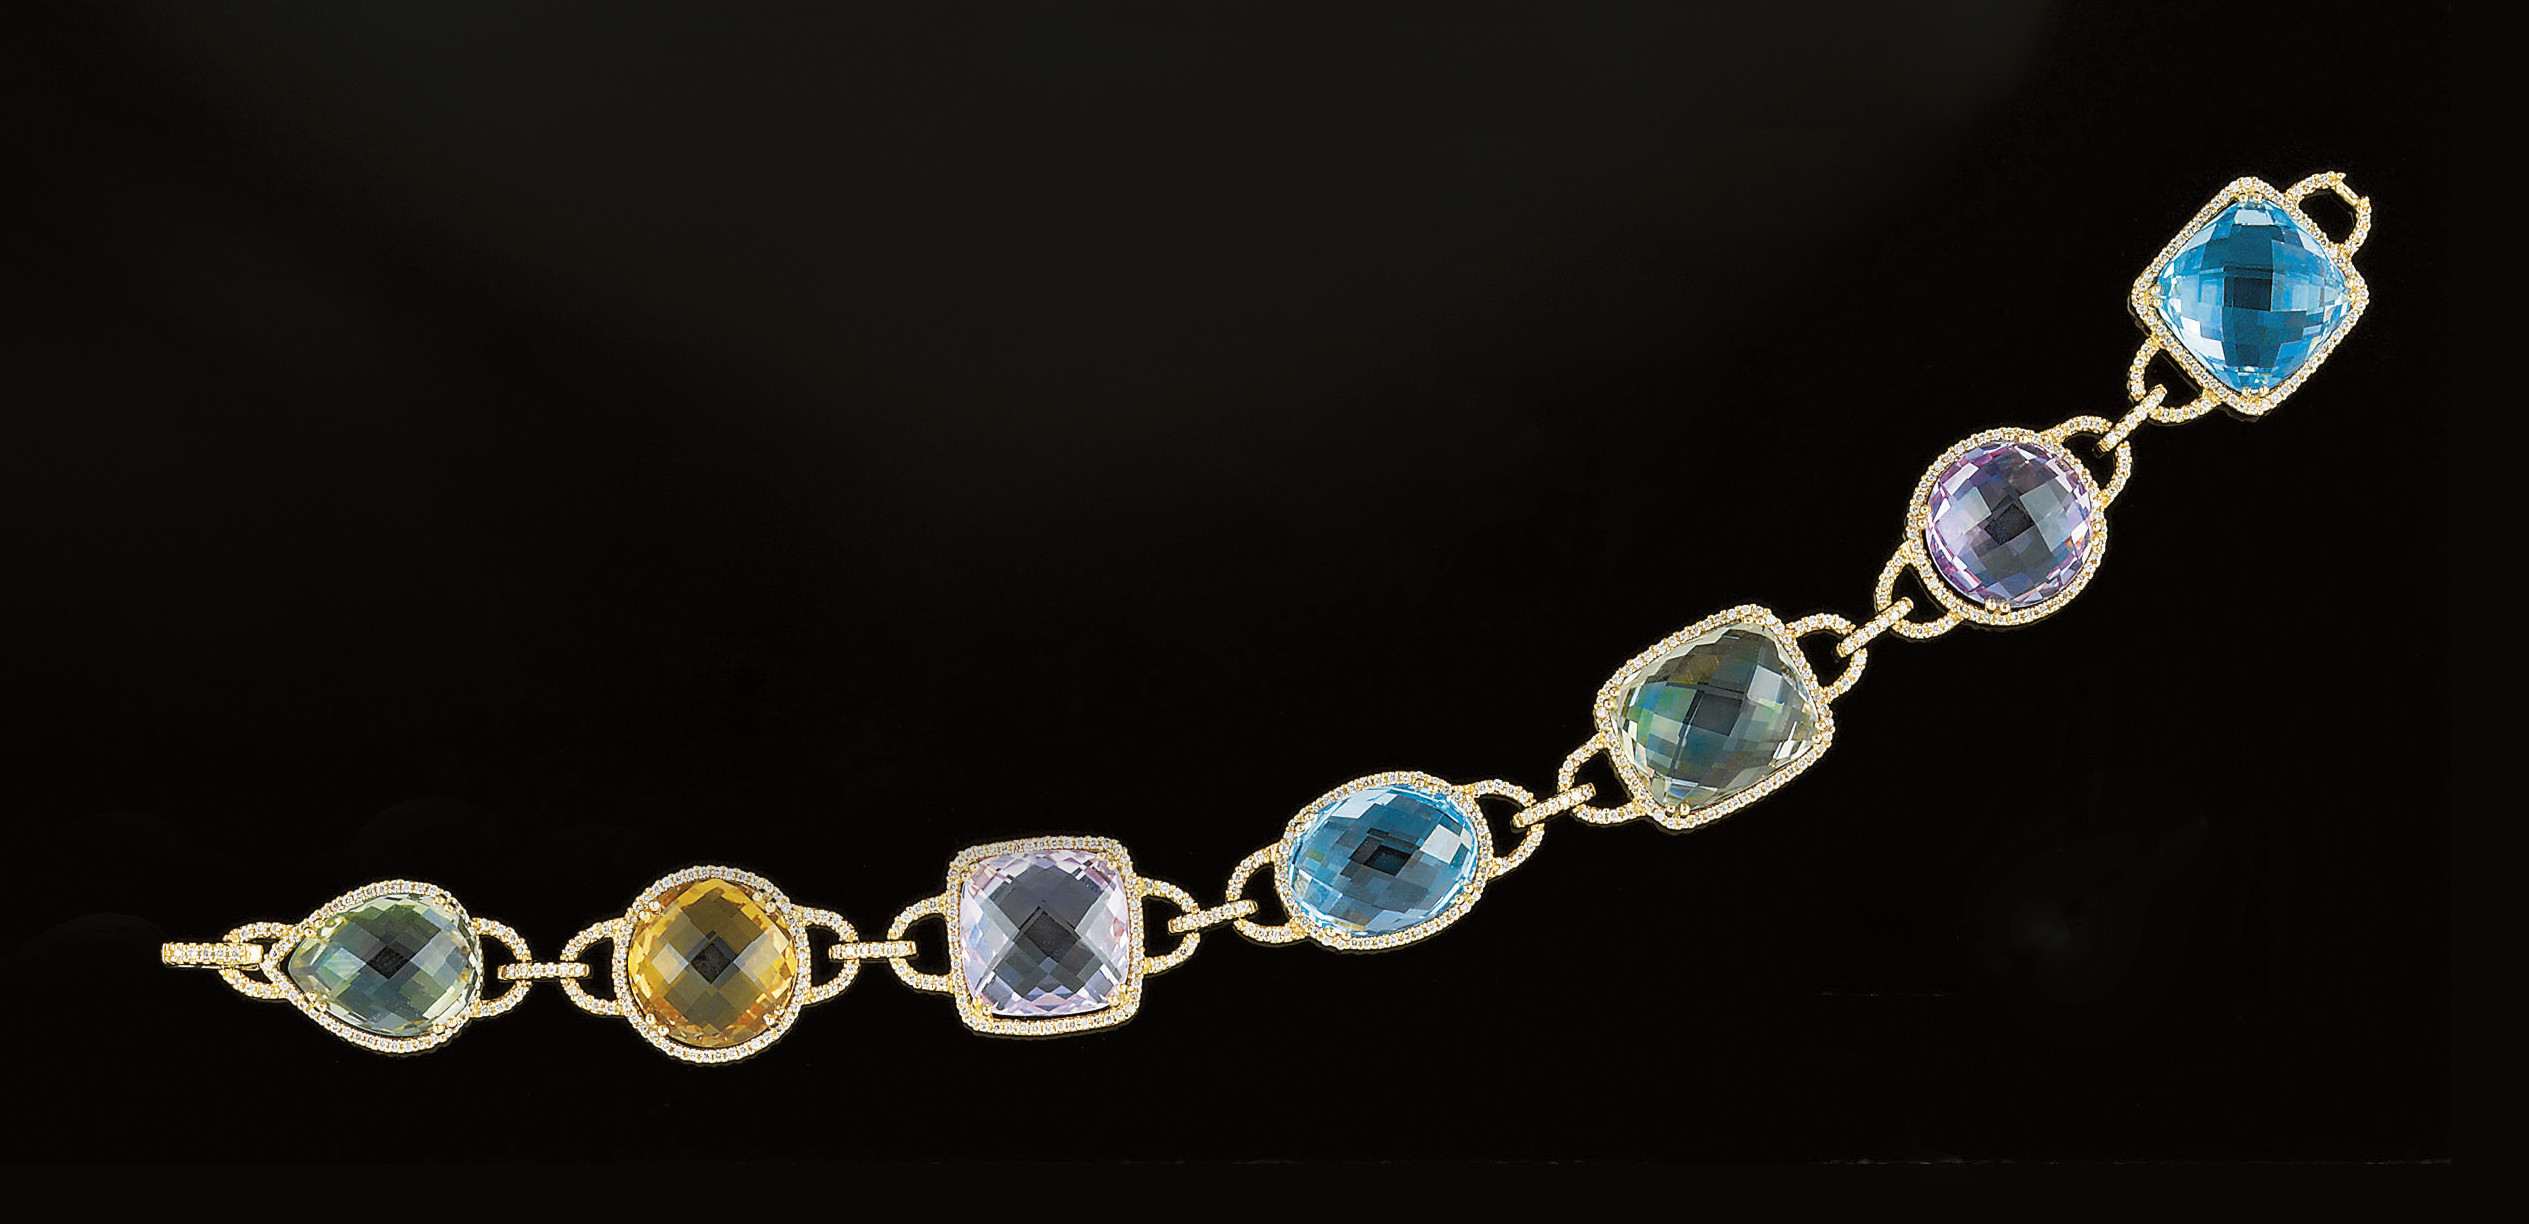 A gem and diamond bracelet